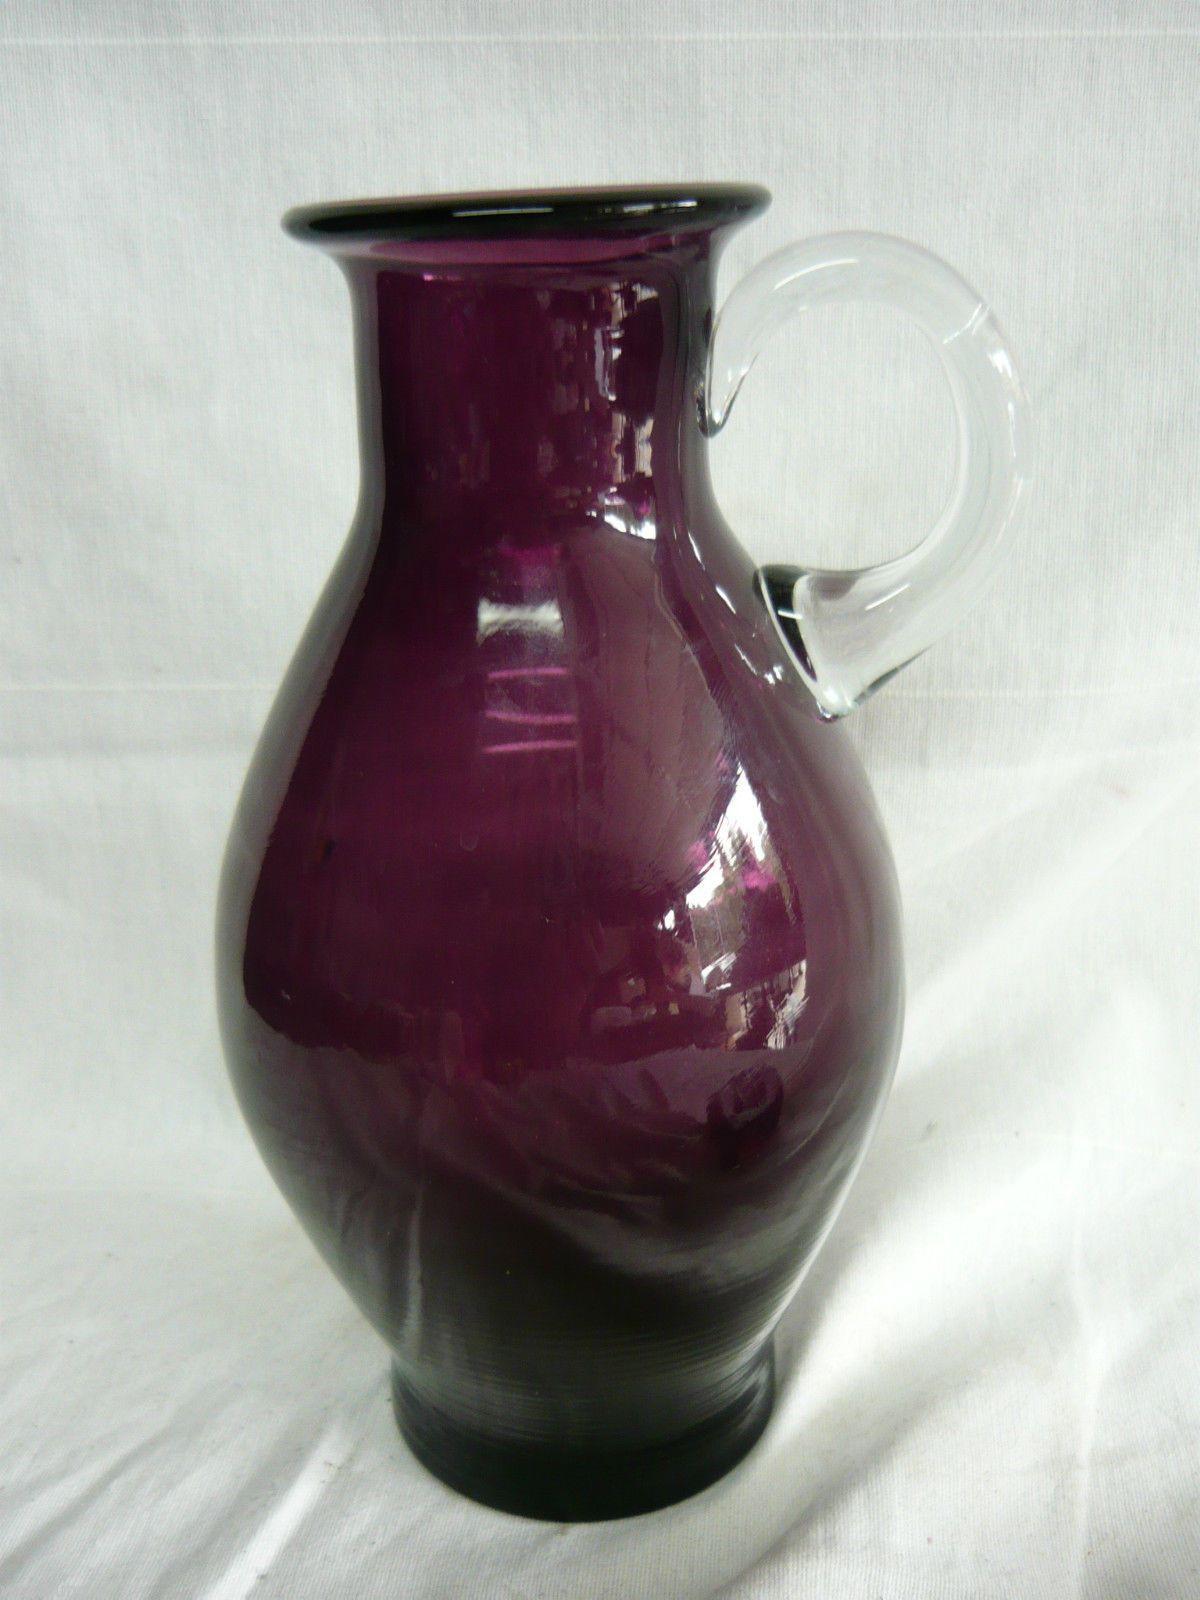 glass pitcher vase of vintage amethyst glass pitcher mid century danish modern hadeland intended for vintage amethyst glass pitcher mid century danish modern hadeland norway purple